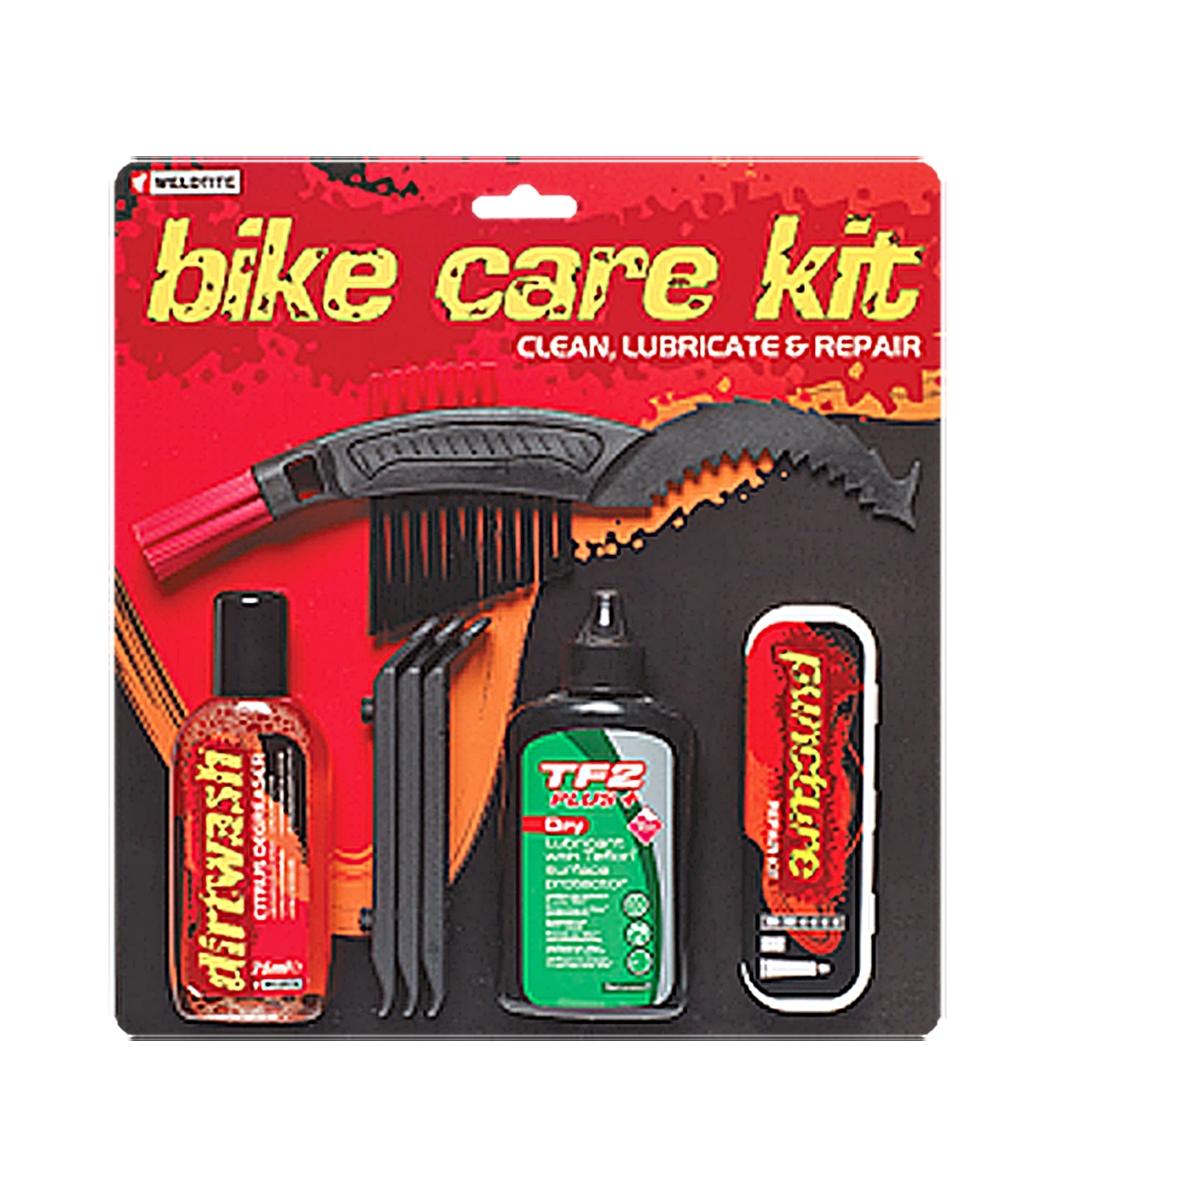 Kit D Entretien Weldtite / Bike Care Kit Lubrifiant / Nettoyant / Kit Reparation